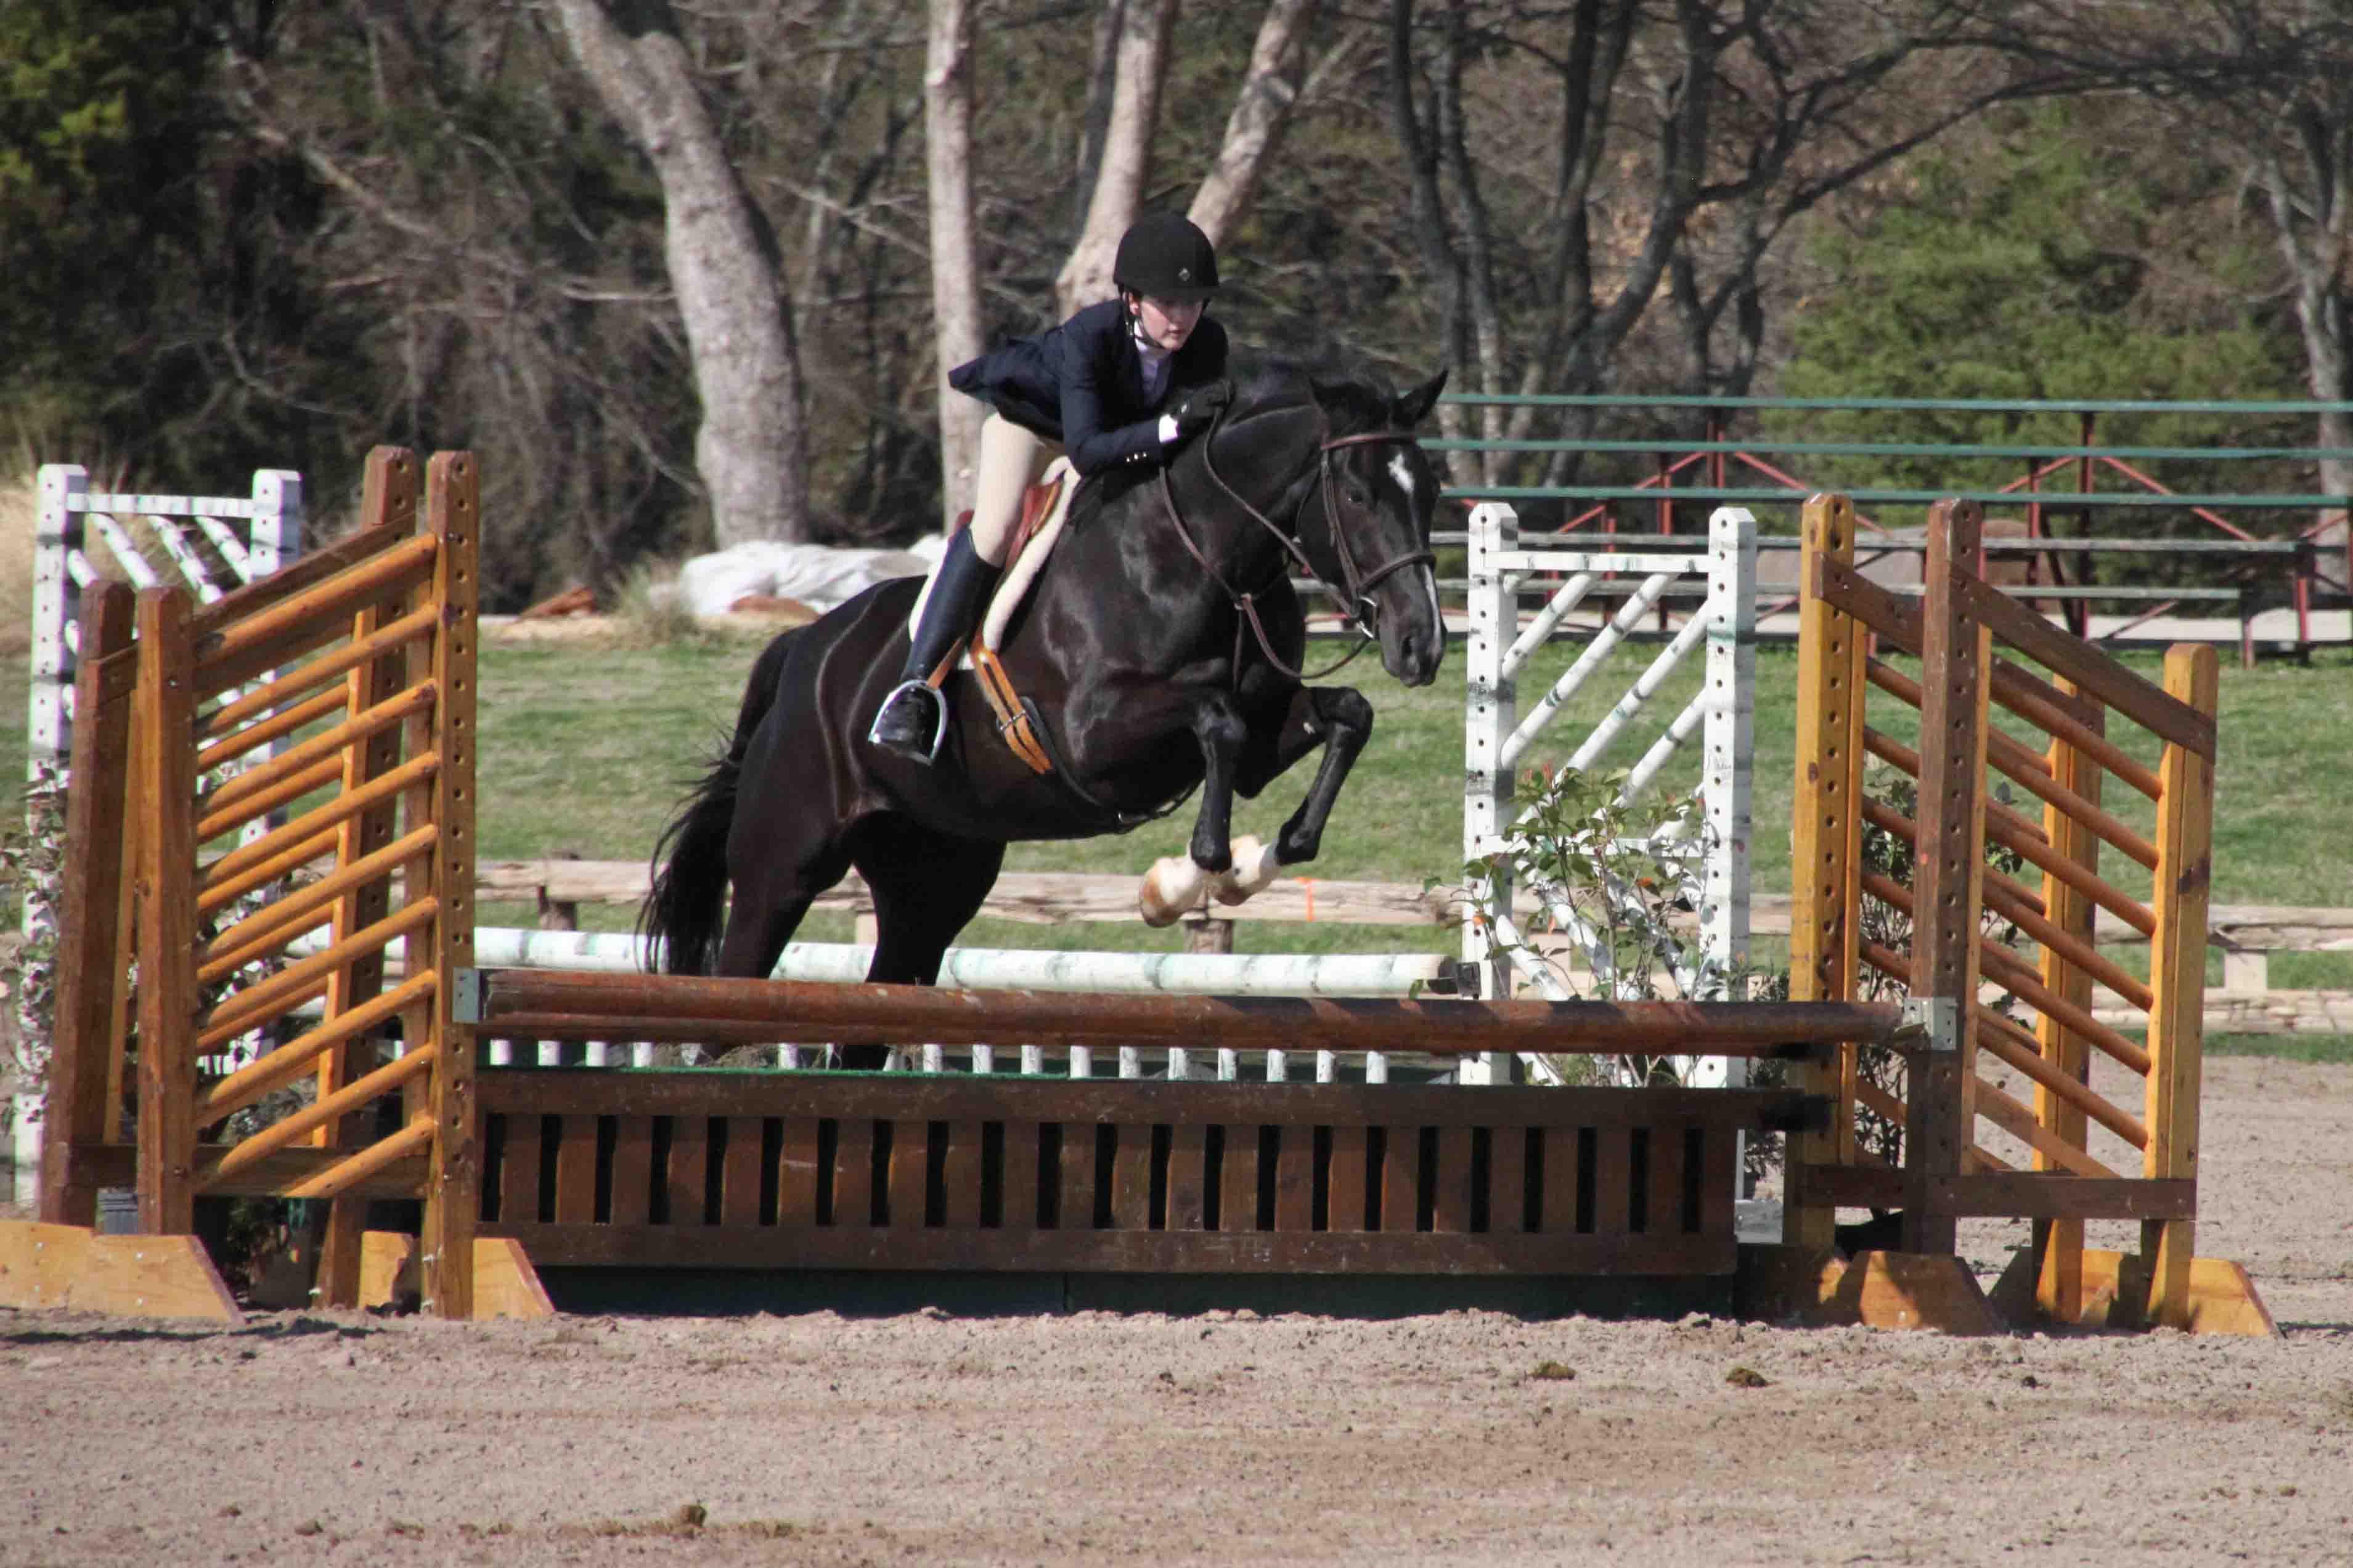 Black horses jumping - photo#25